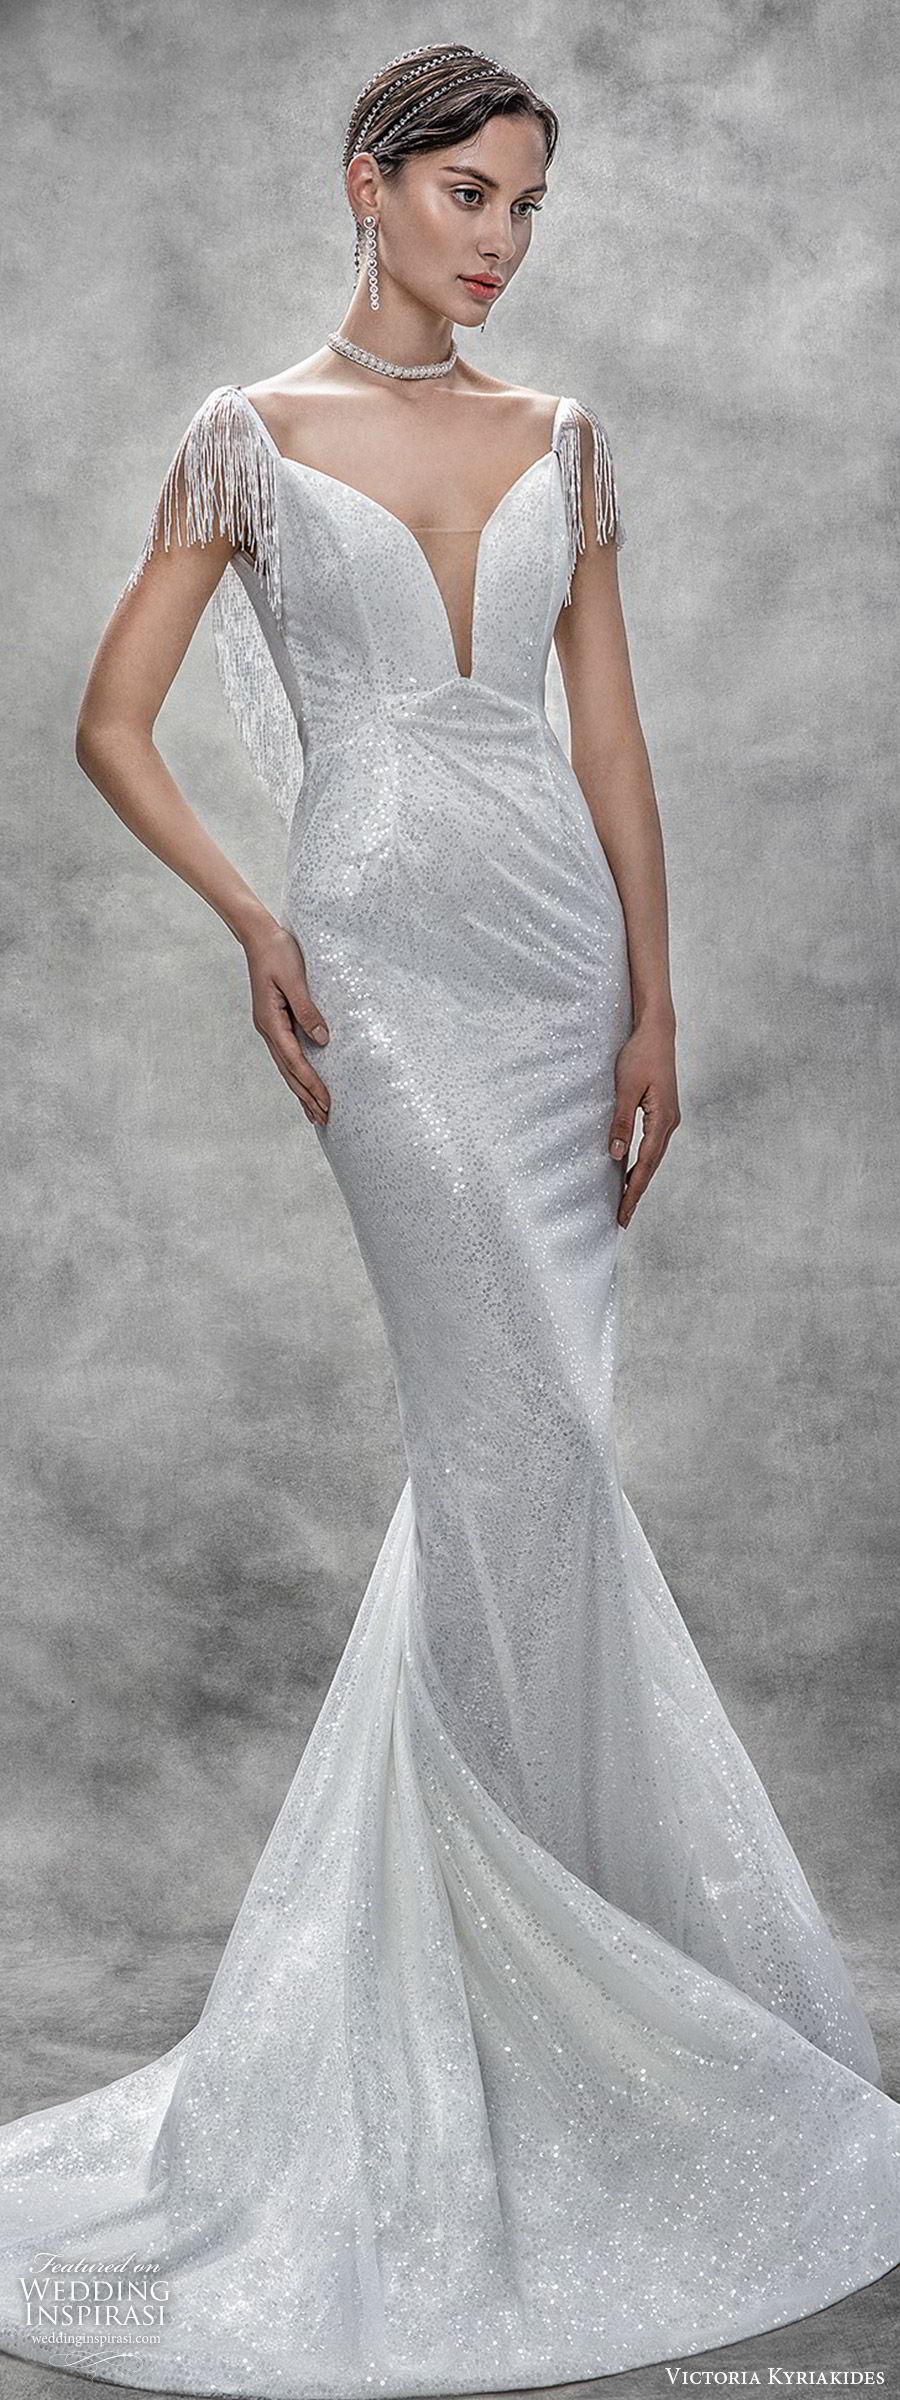 victoria kyriakides spring 2020 bridal beaded fringe short sleeves split sweetheart neckline sheath wedding dress (17) chapel train glitzy glam vintage mv